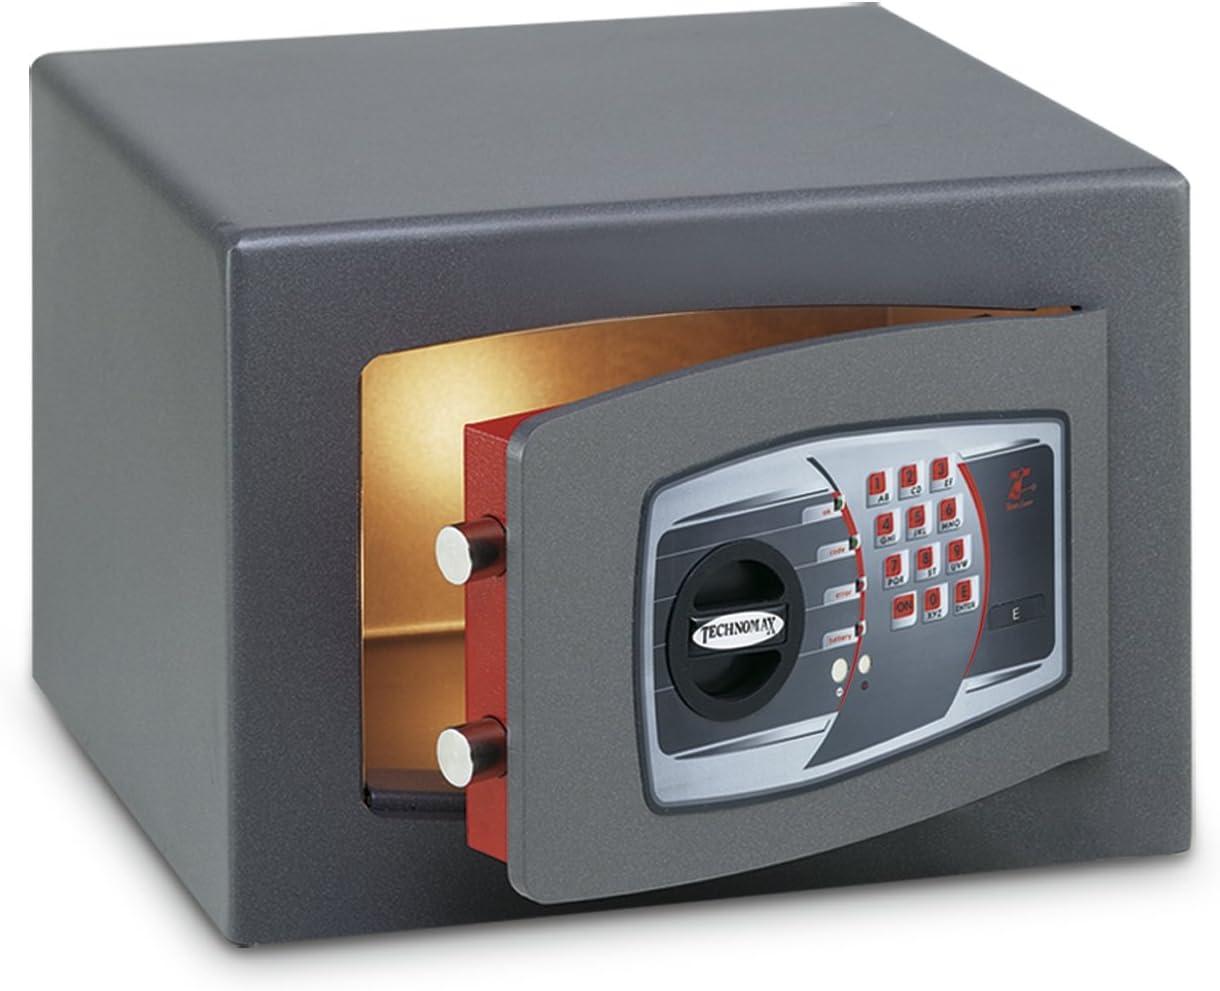 Technomax DMT//5P Cassaforte da tavolo elettronico